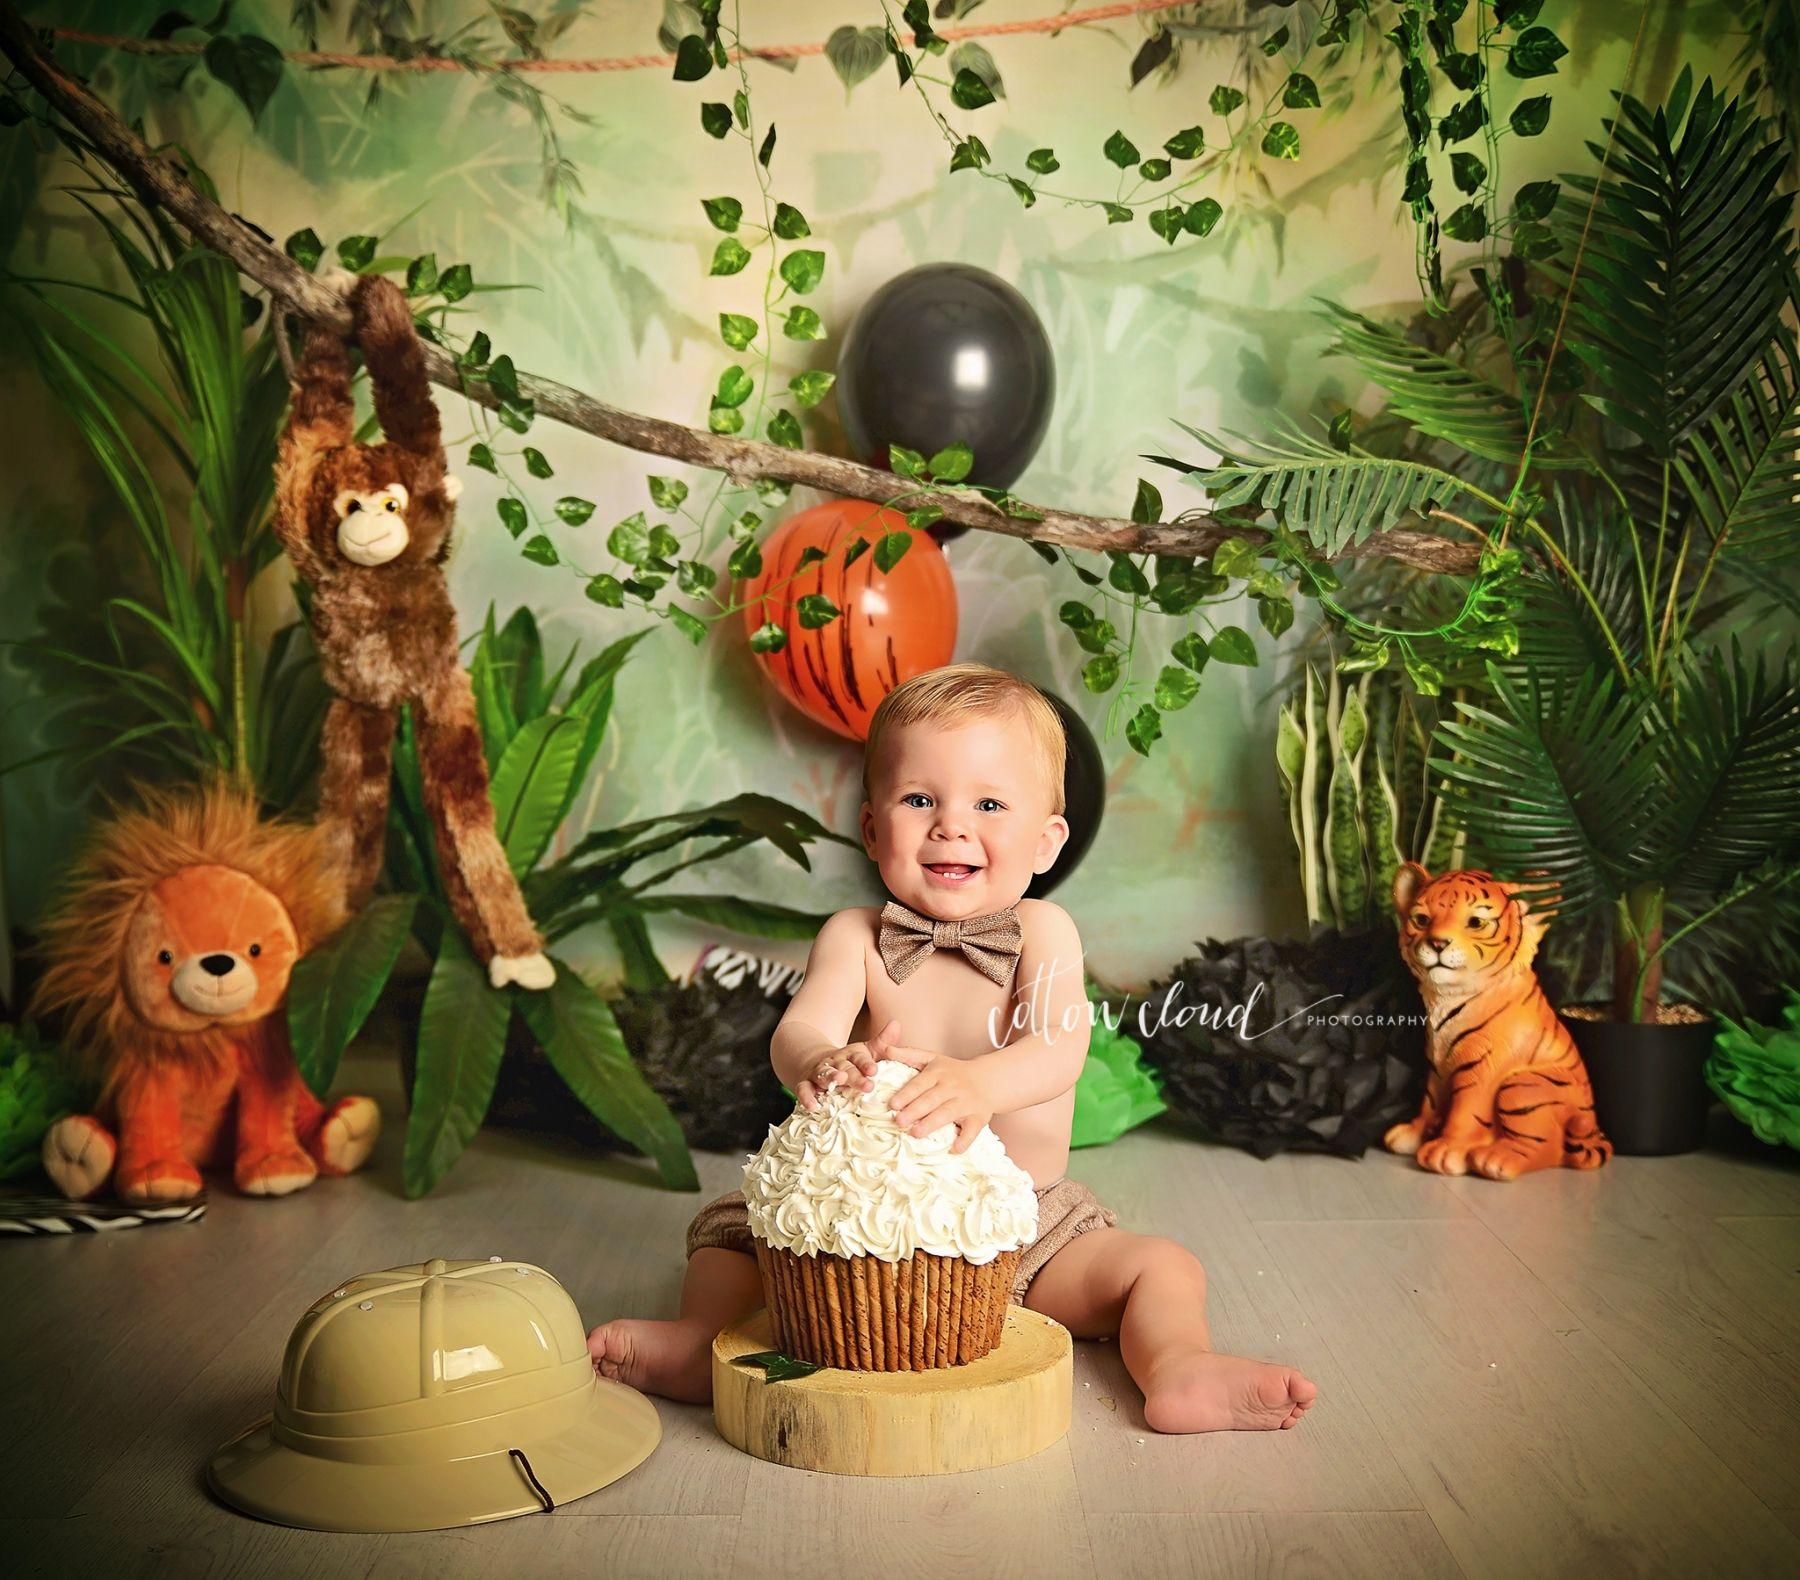 Cake smash in 2020 jungle theme birthday cake smash